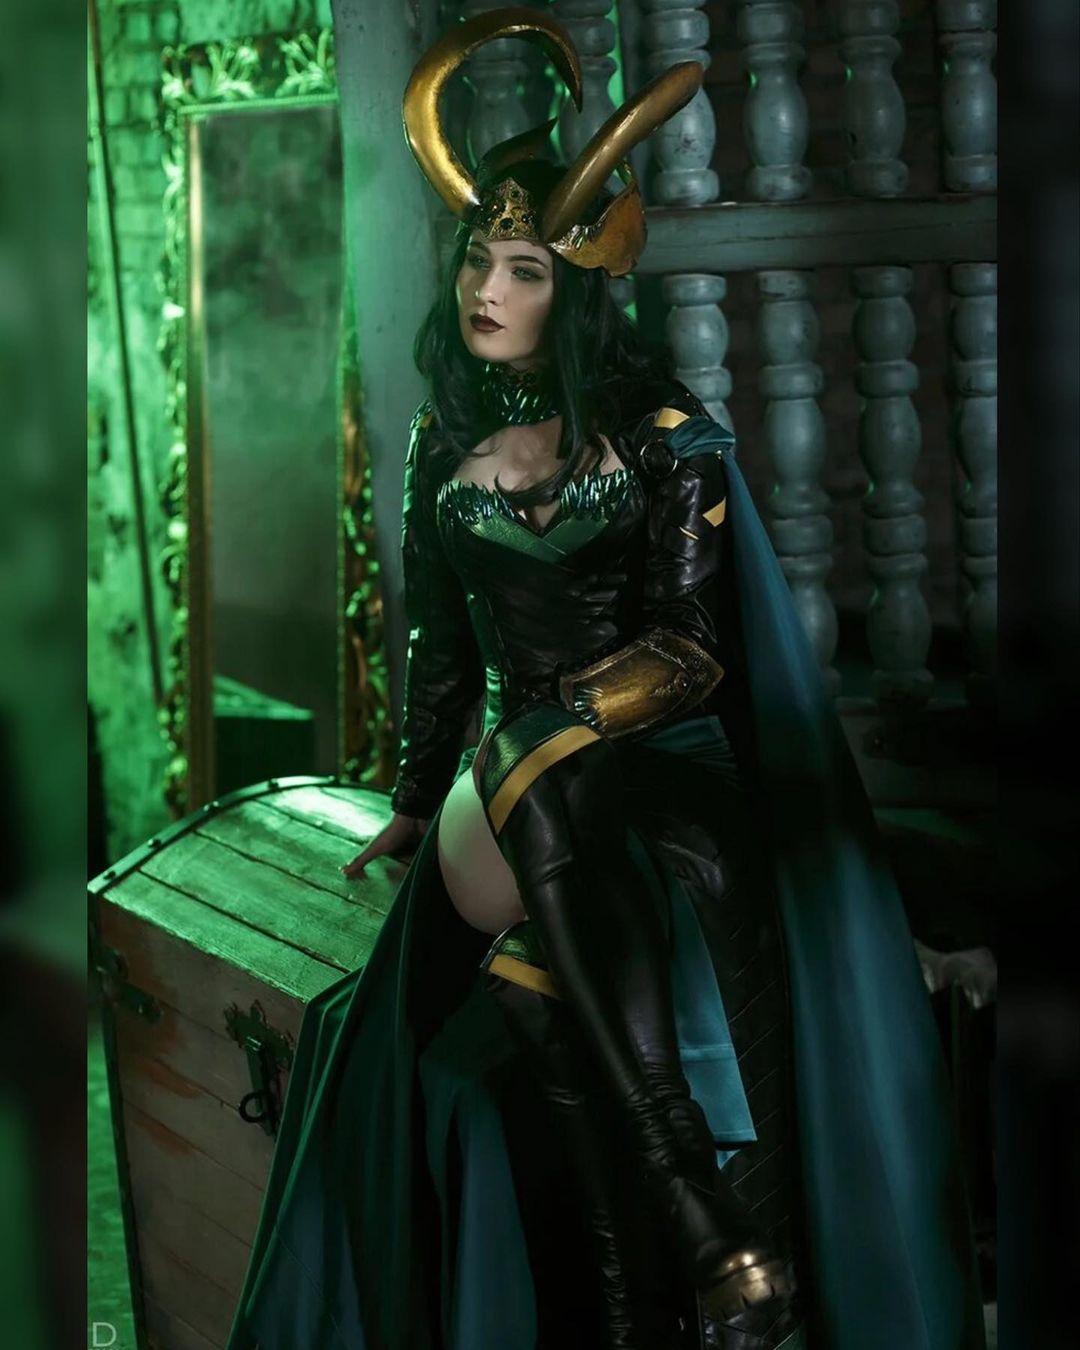 Marvel: Chica se convierte en Lady Loki gracias a este asombroso cosplay